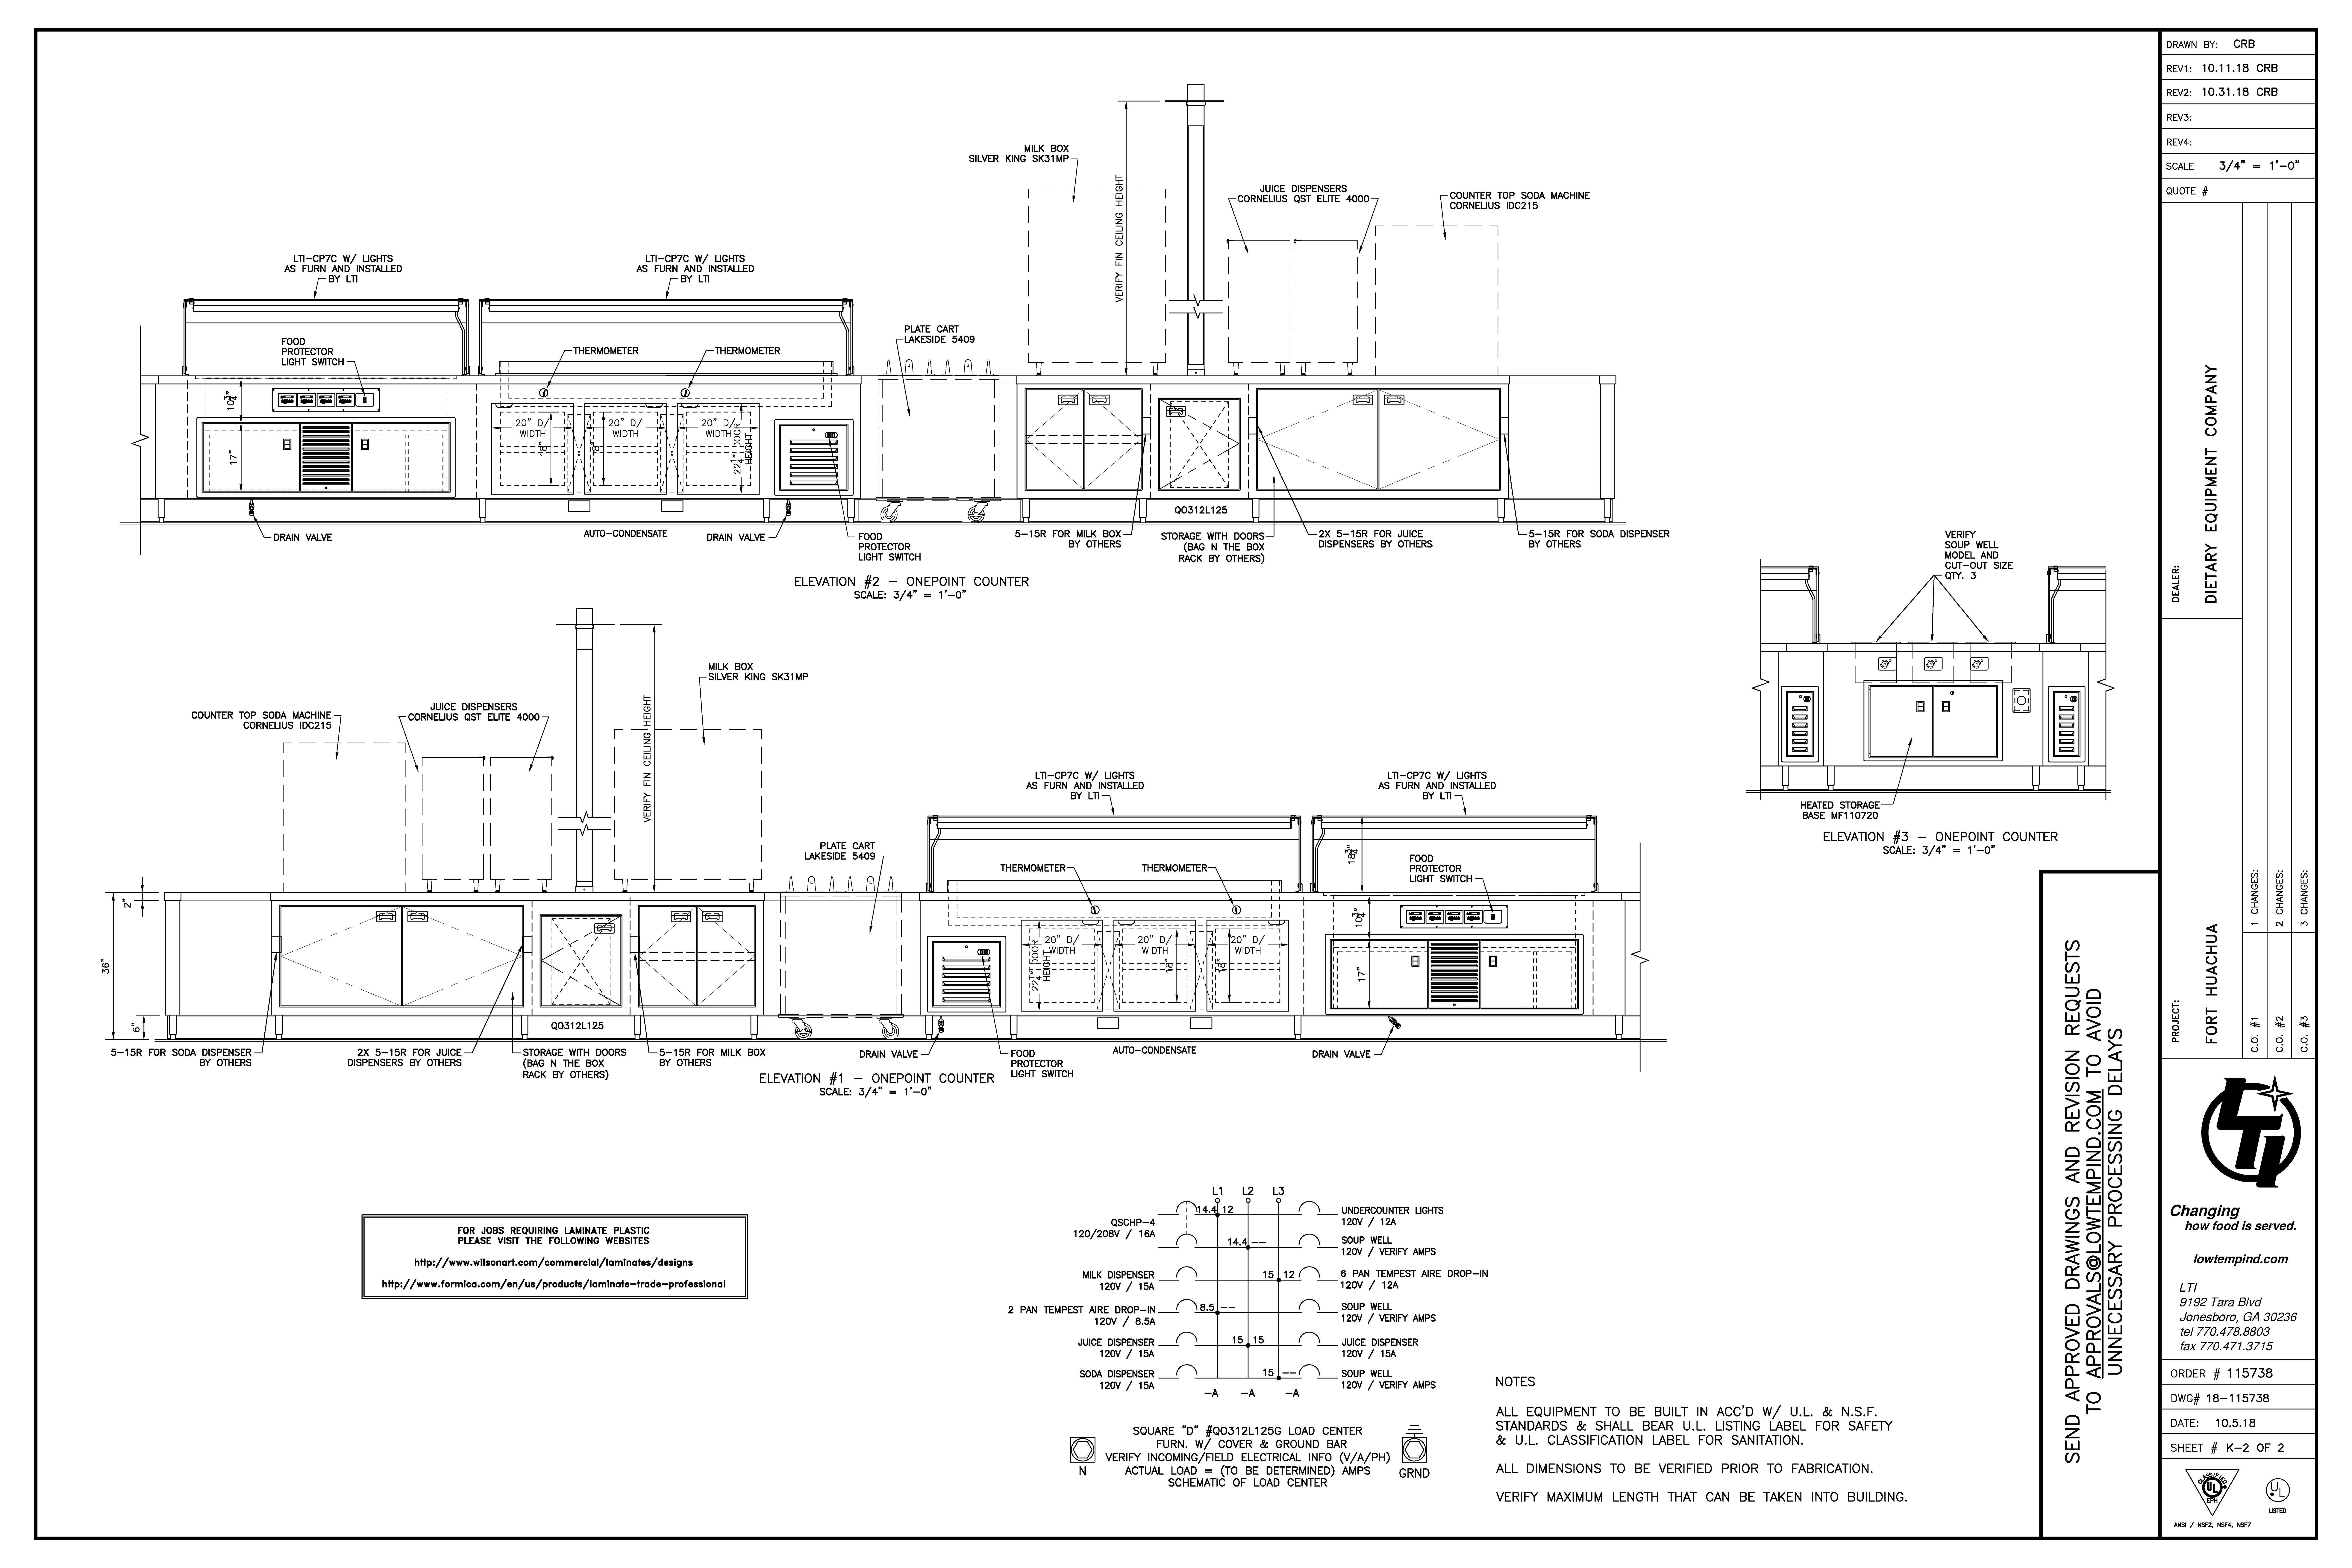 fort-huachua-drawings-copy-2.jpg